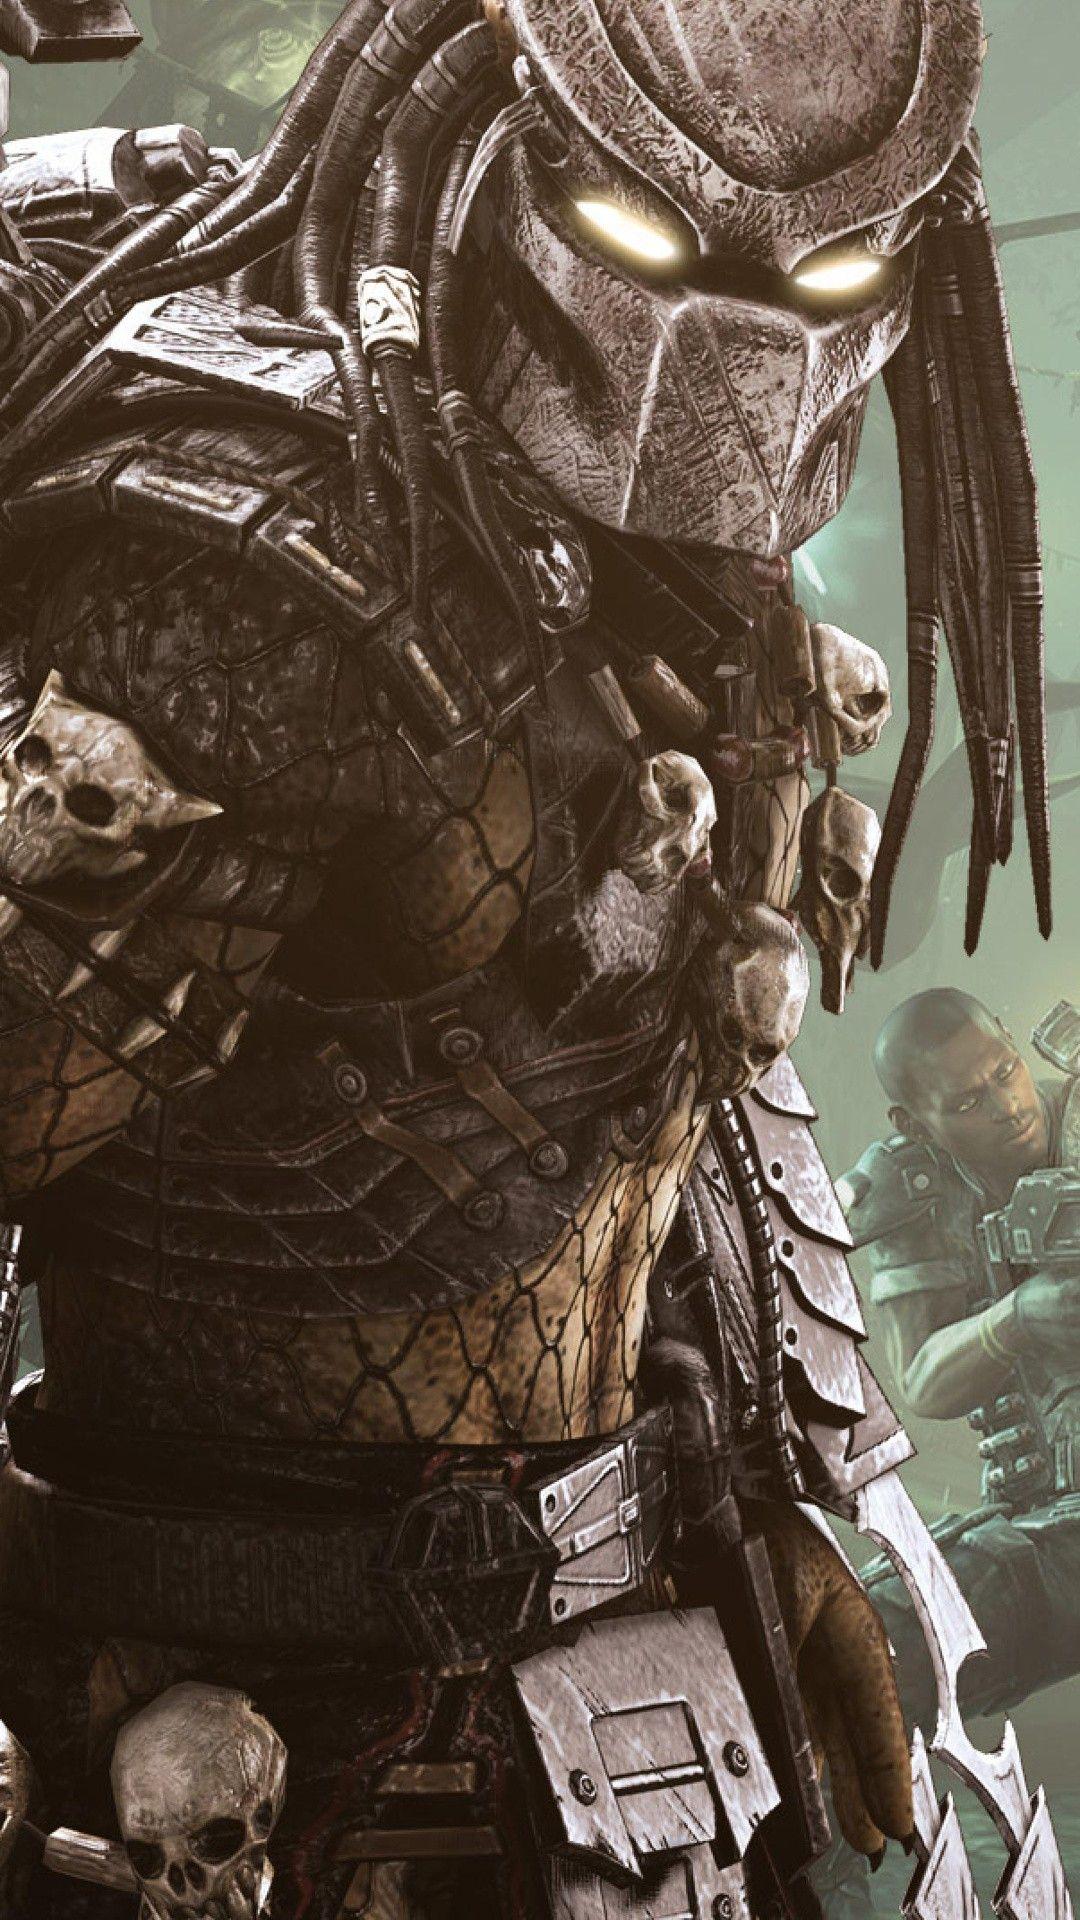 Pin By Fiamma Magallanes On Predators Yautja In 2020 Predator Artwork Alien Vs Predator Predator